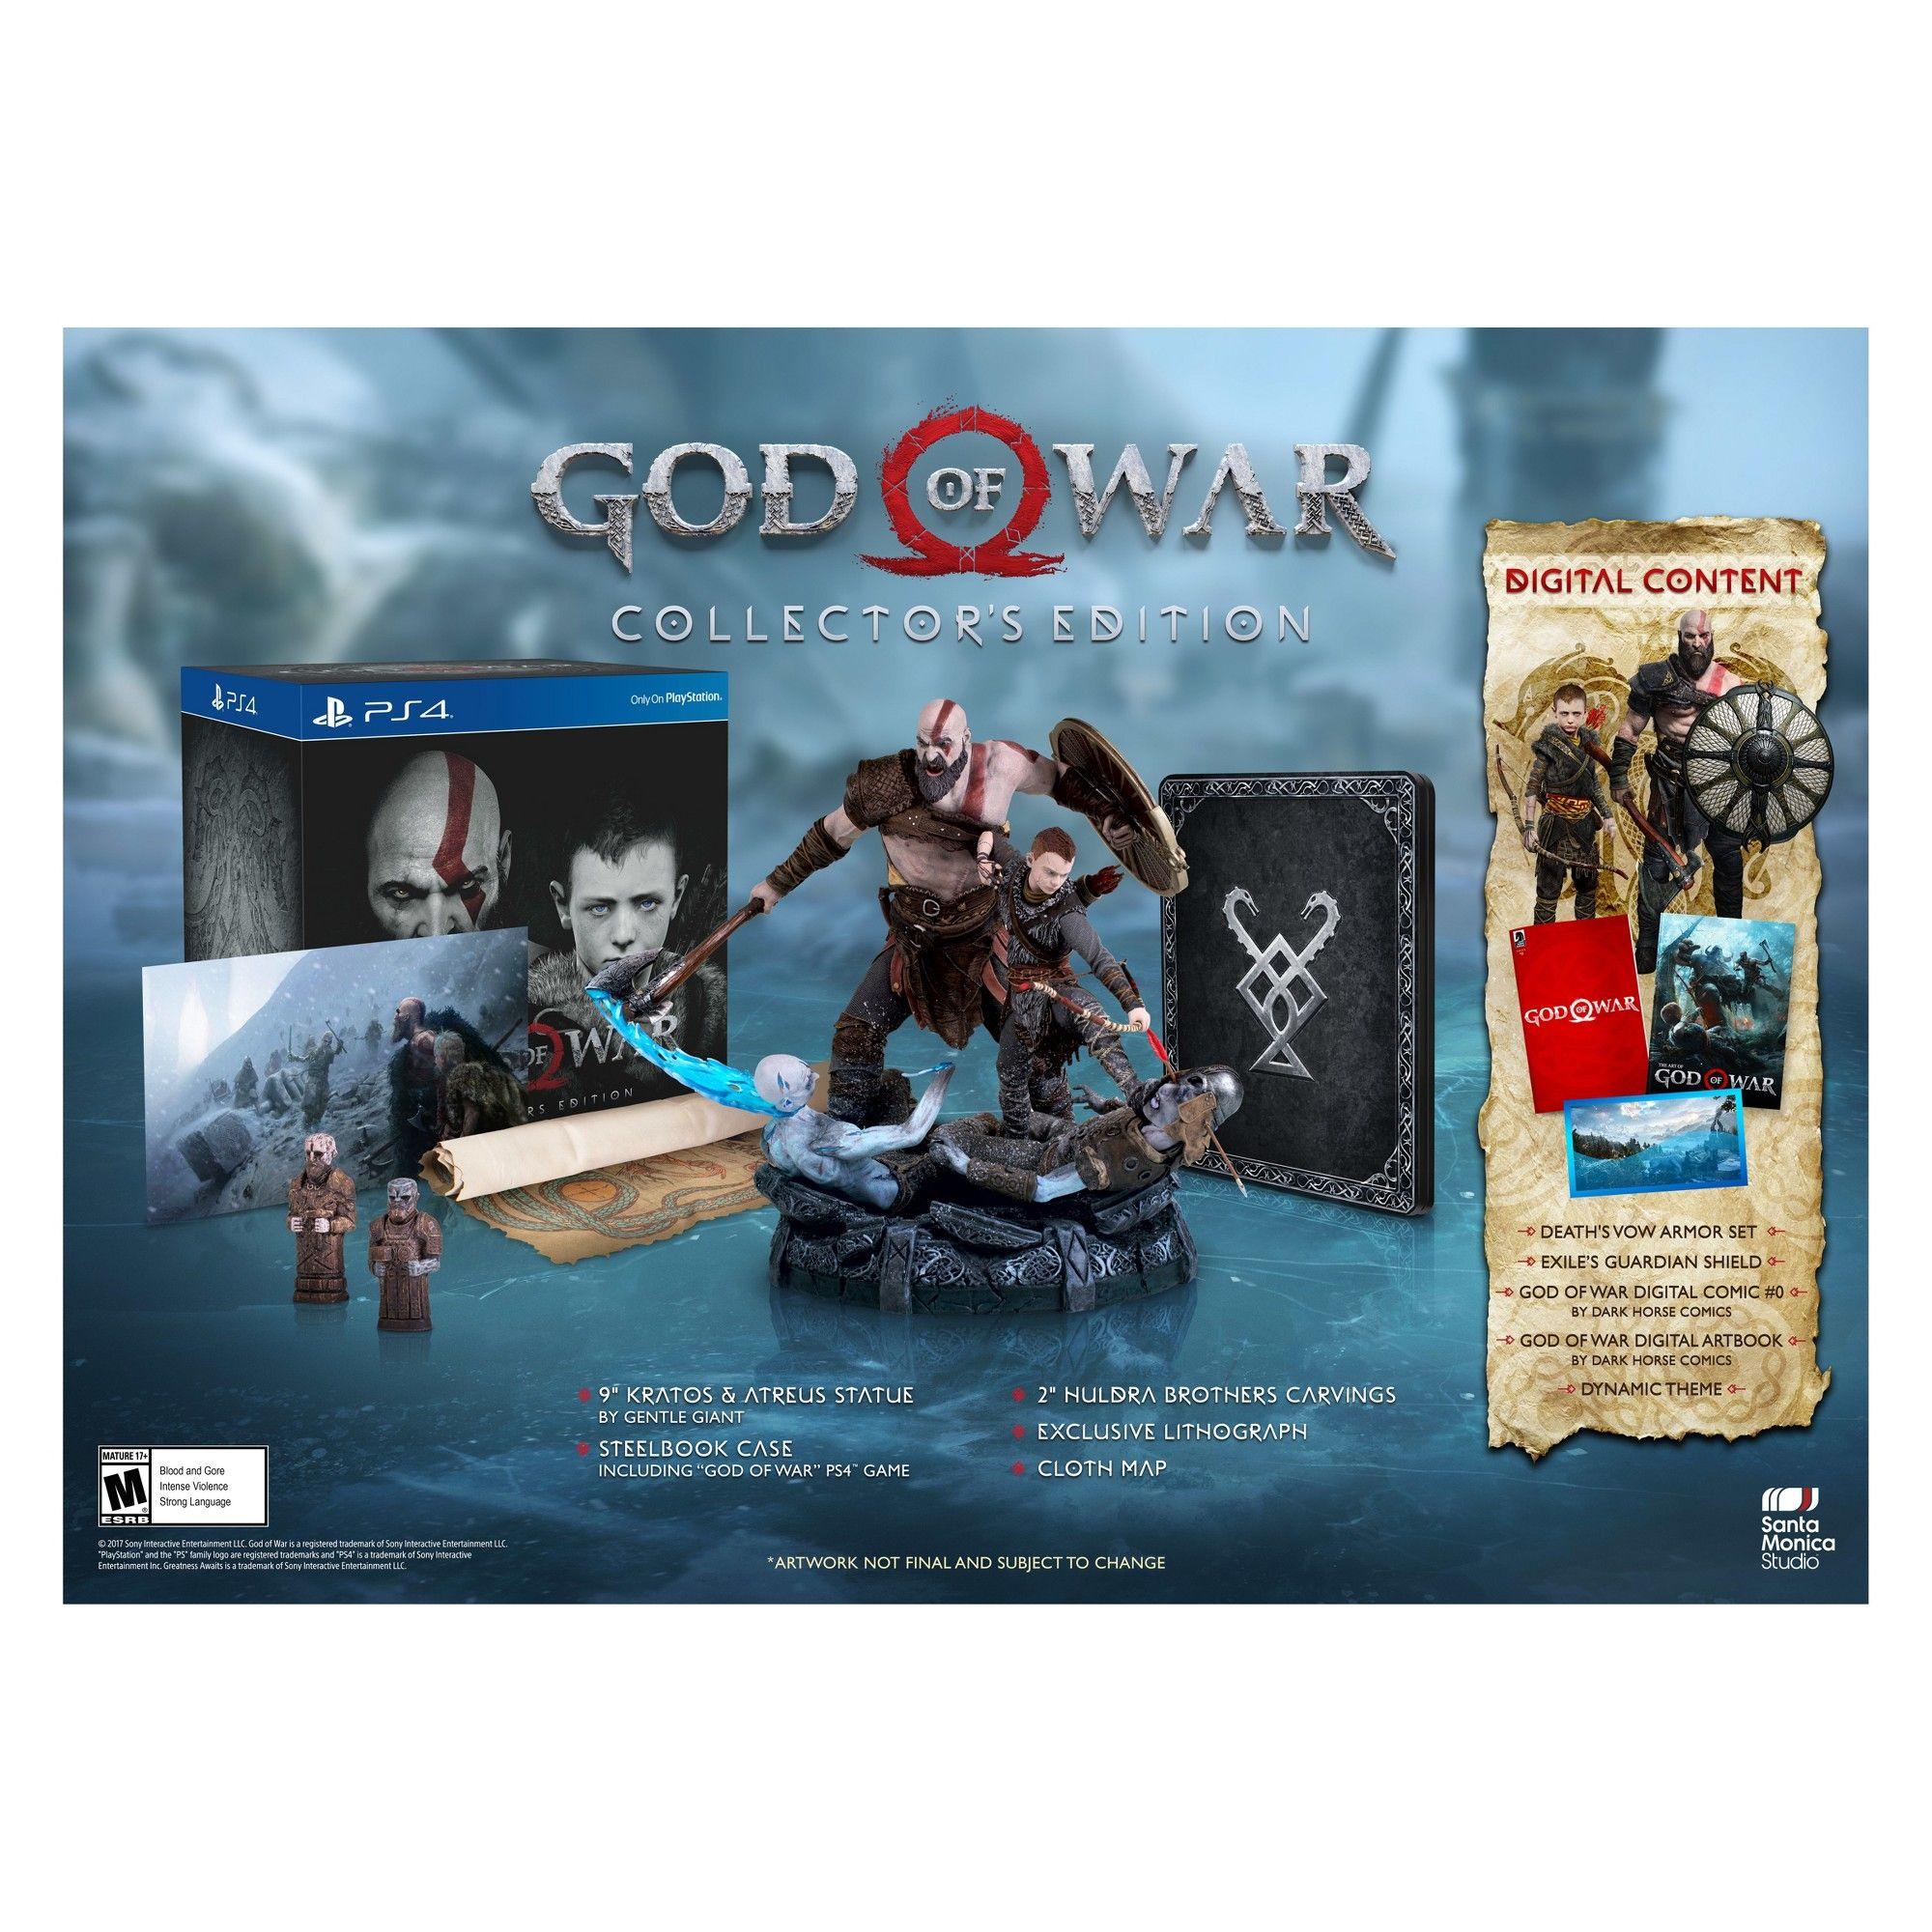 Ps4 Video Games God Of War God Of War Playstation 4 Playstation